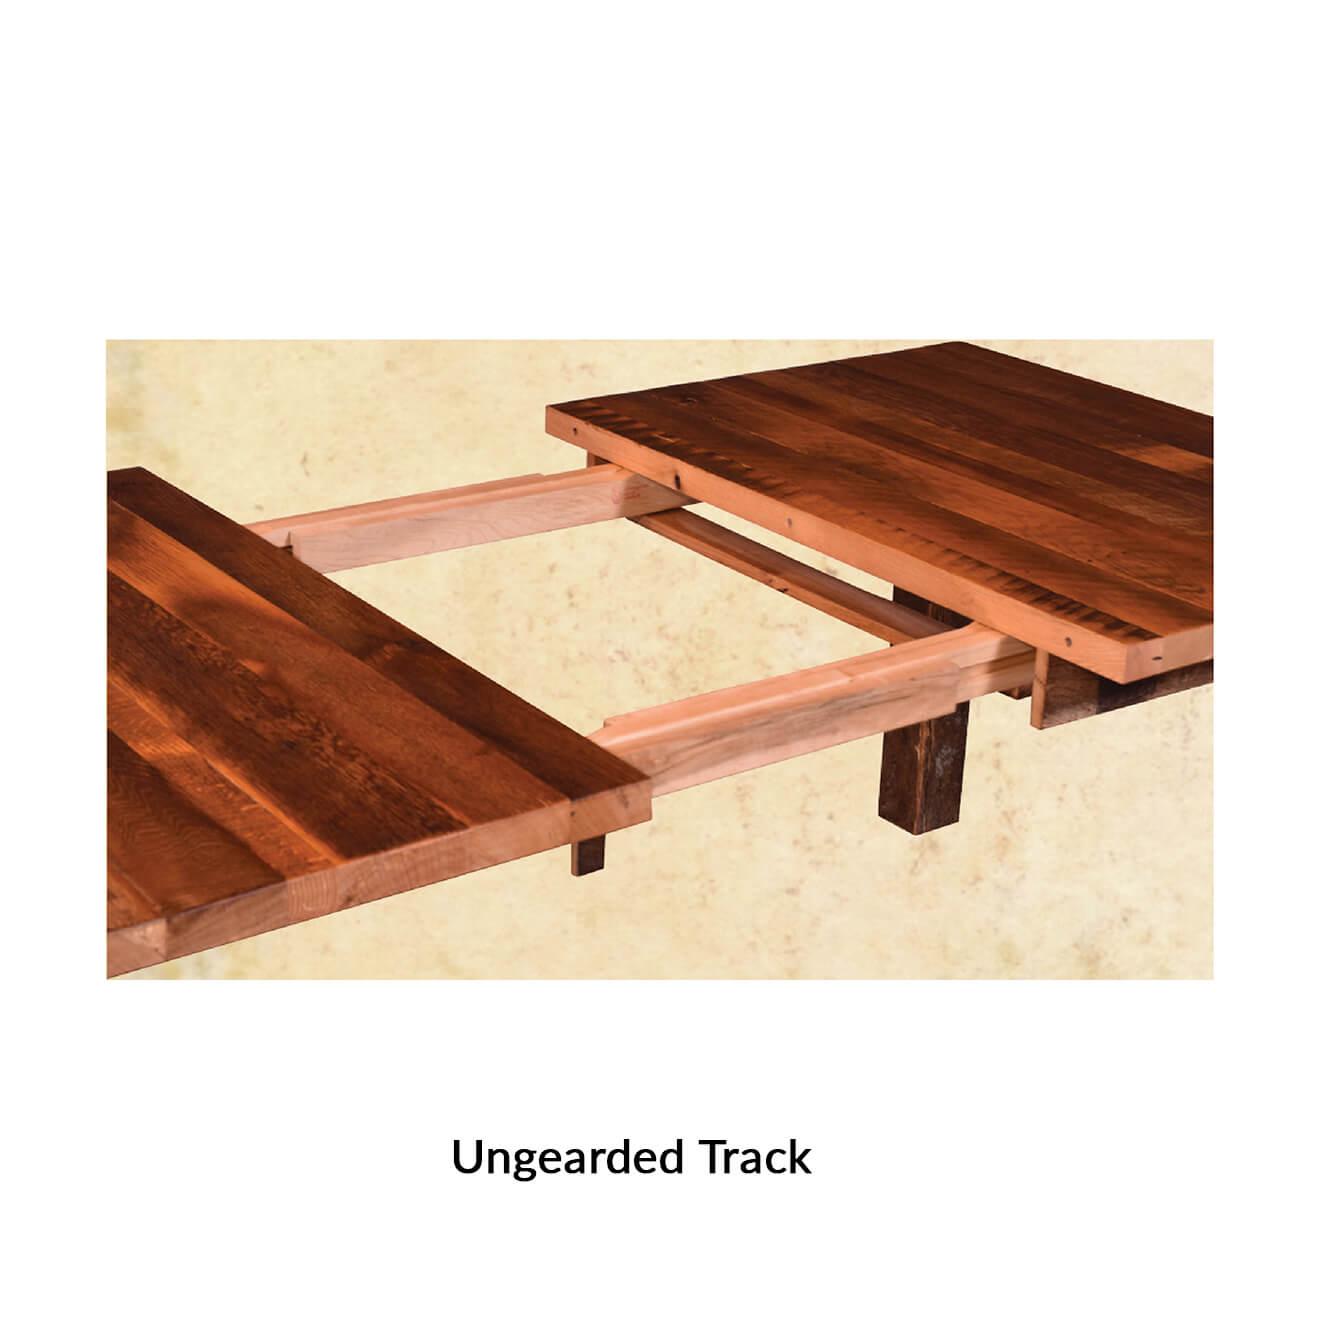 2.0-ungeared-track.jpg